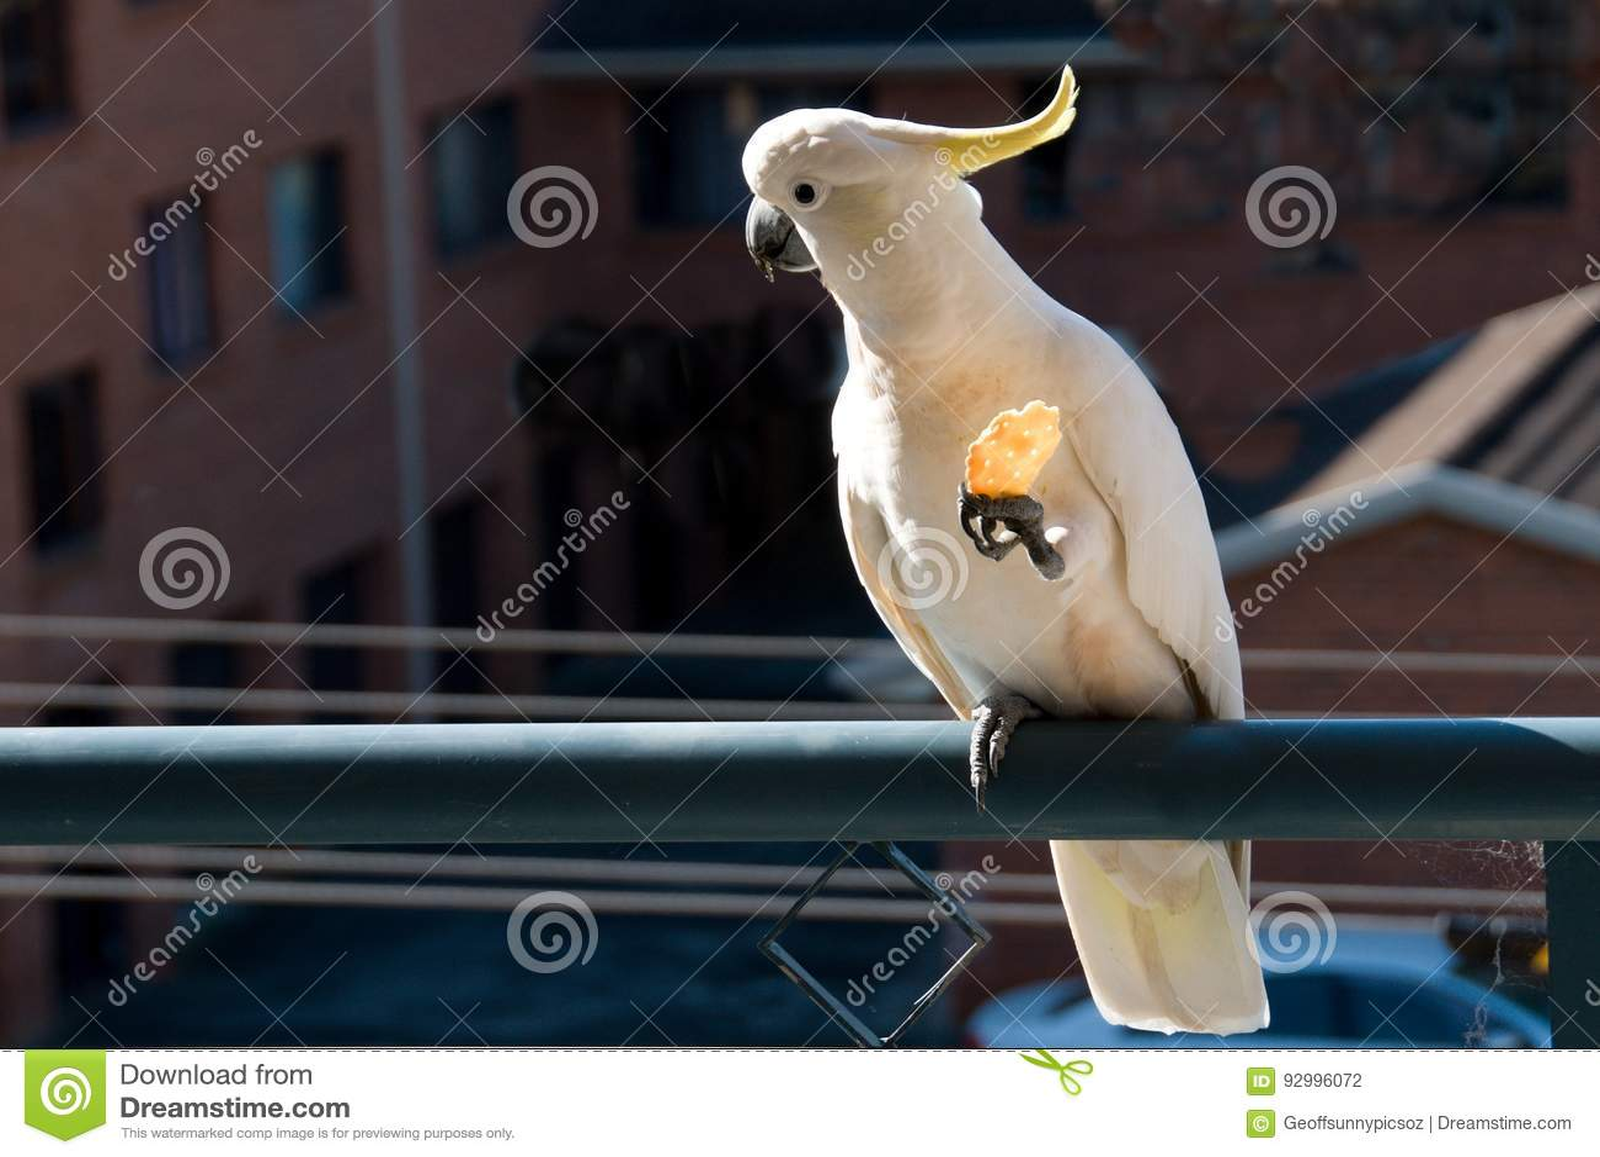 Australian Sulphur-crested Cockatoo eating a cracker. Cacatua ga